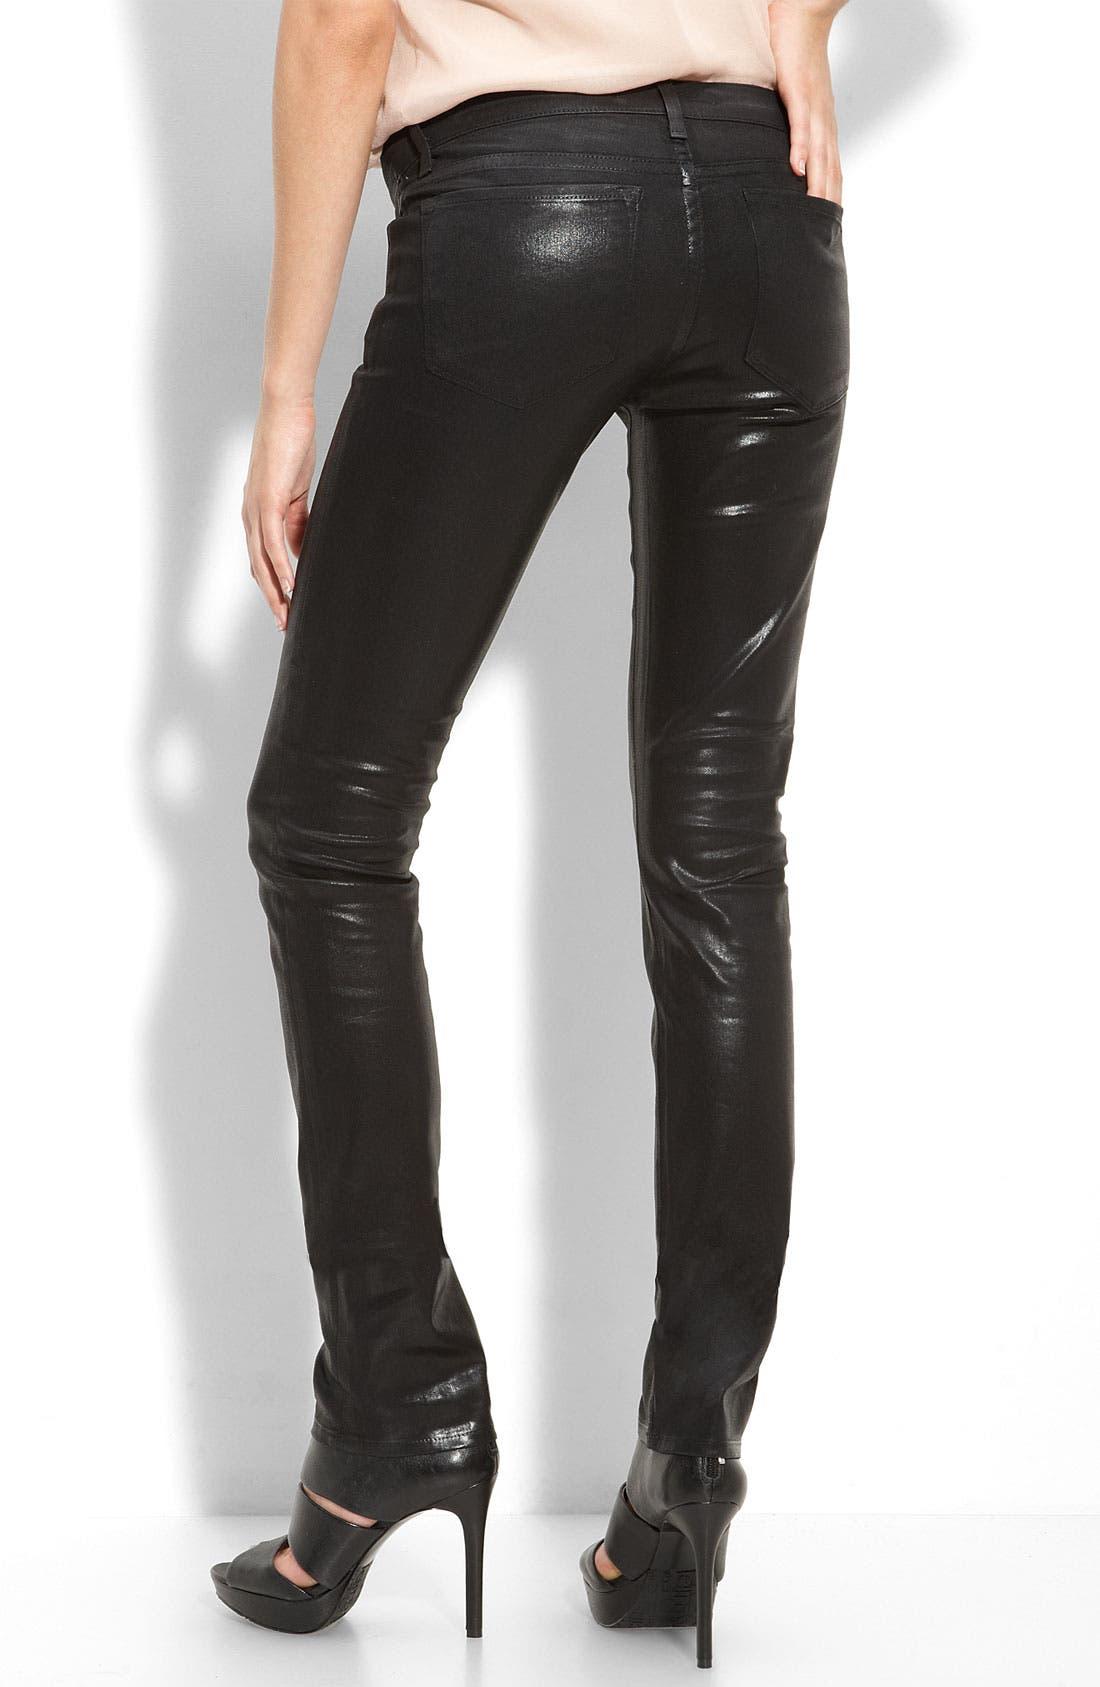 J BRAND Skinny Stretch Jeans, Main, color, 008